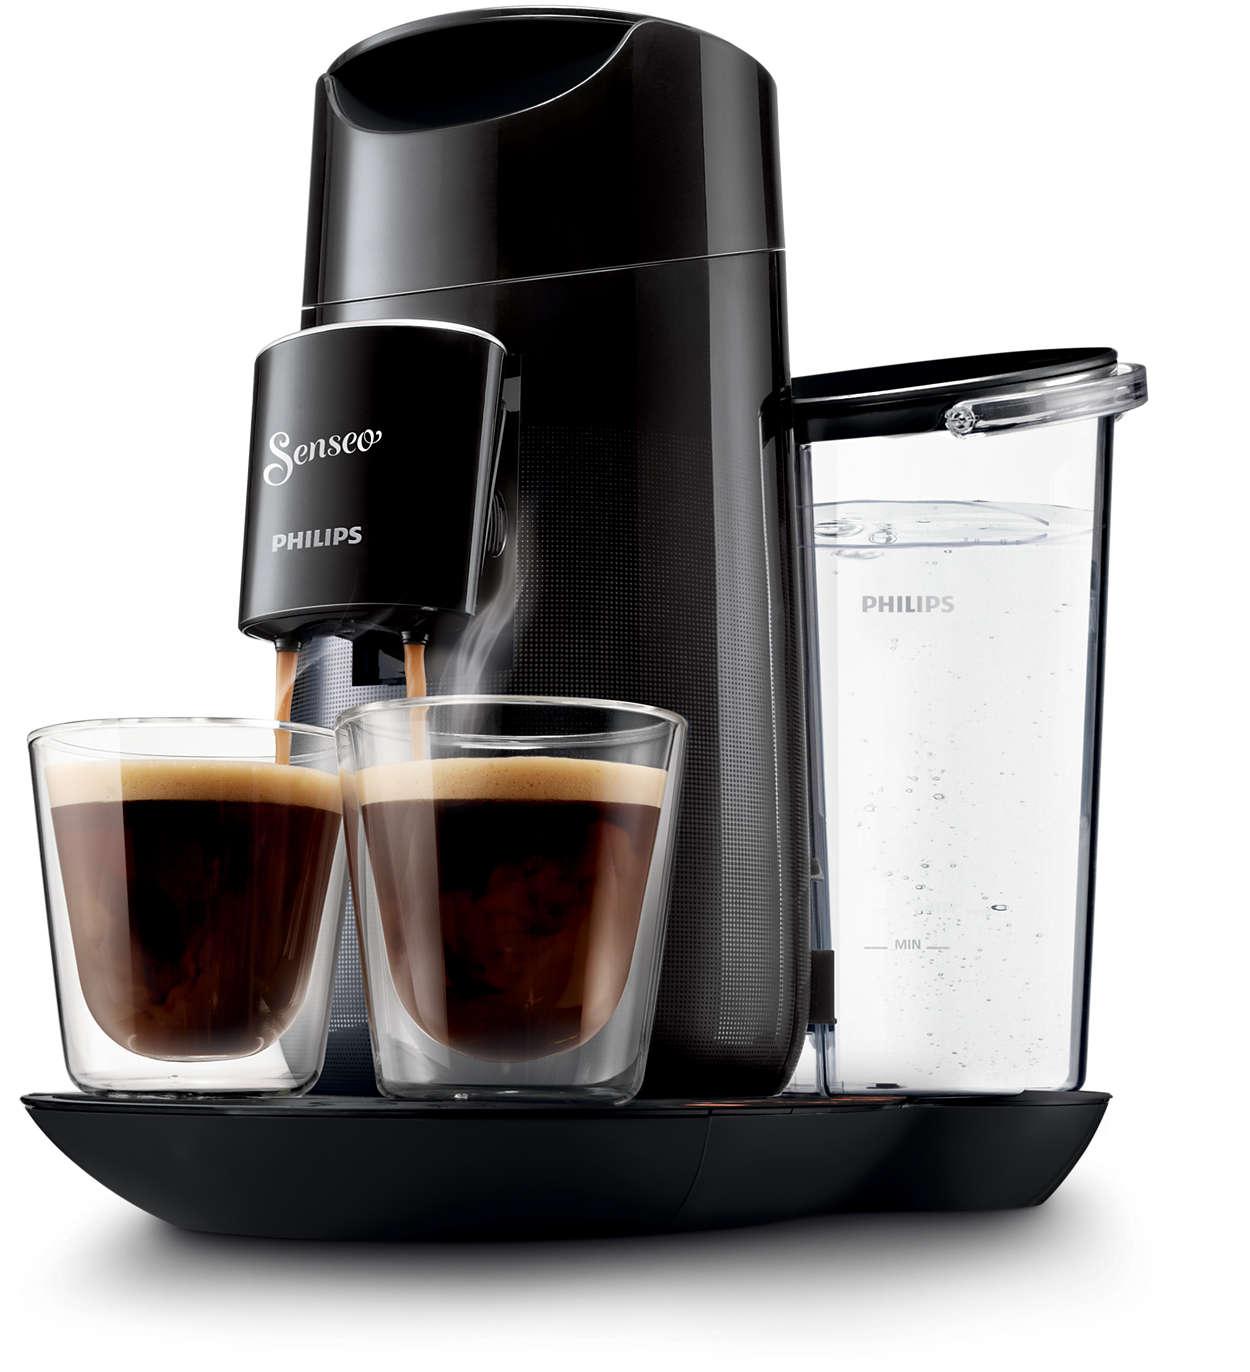 twist kaffeepadmaschine hd7871 60 senseo. Black Bedroom Furniture Sets. Home Design Ideas